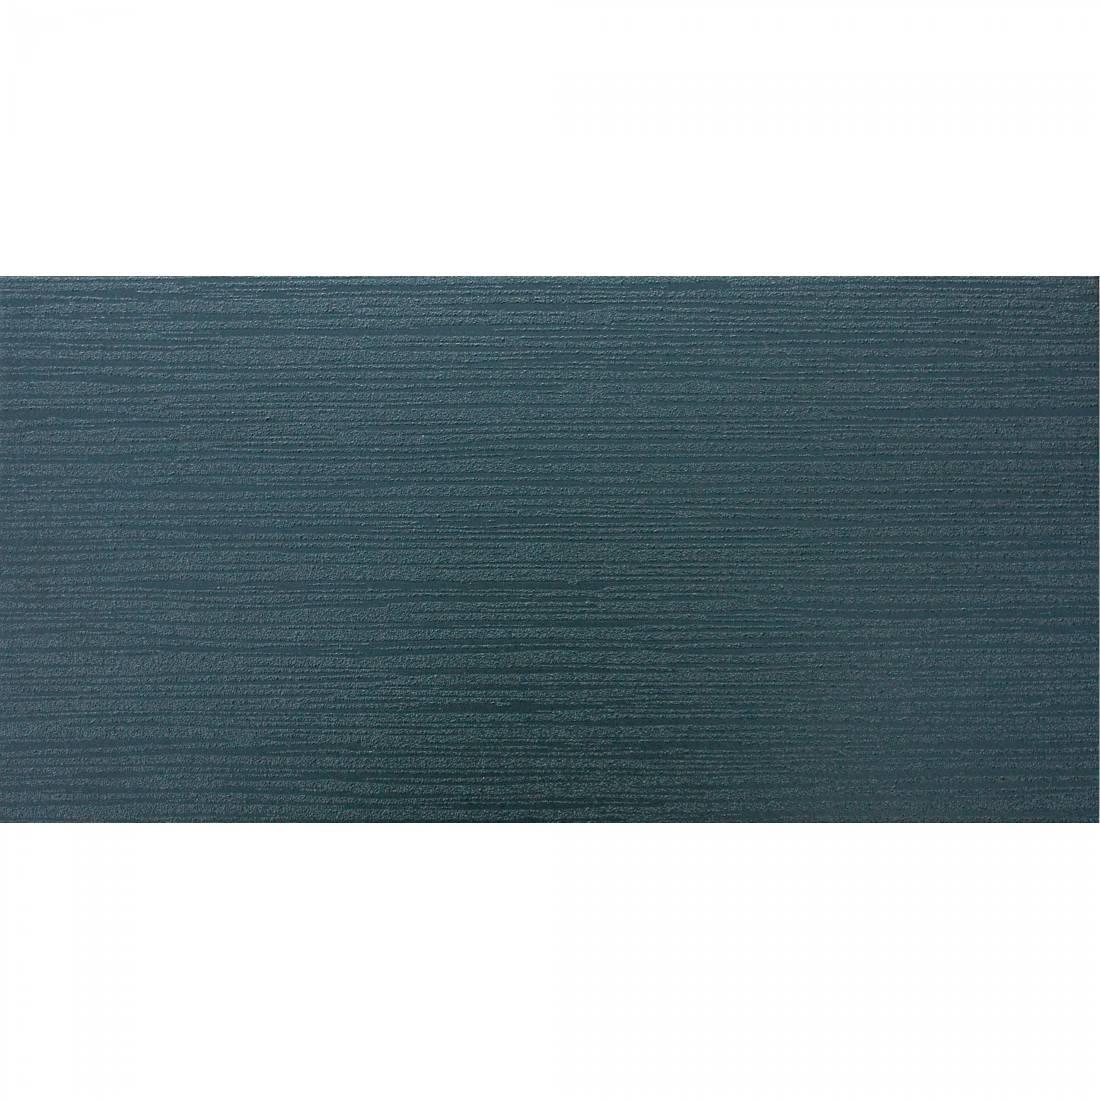 Sparx Charcoal 30x60 Black 1